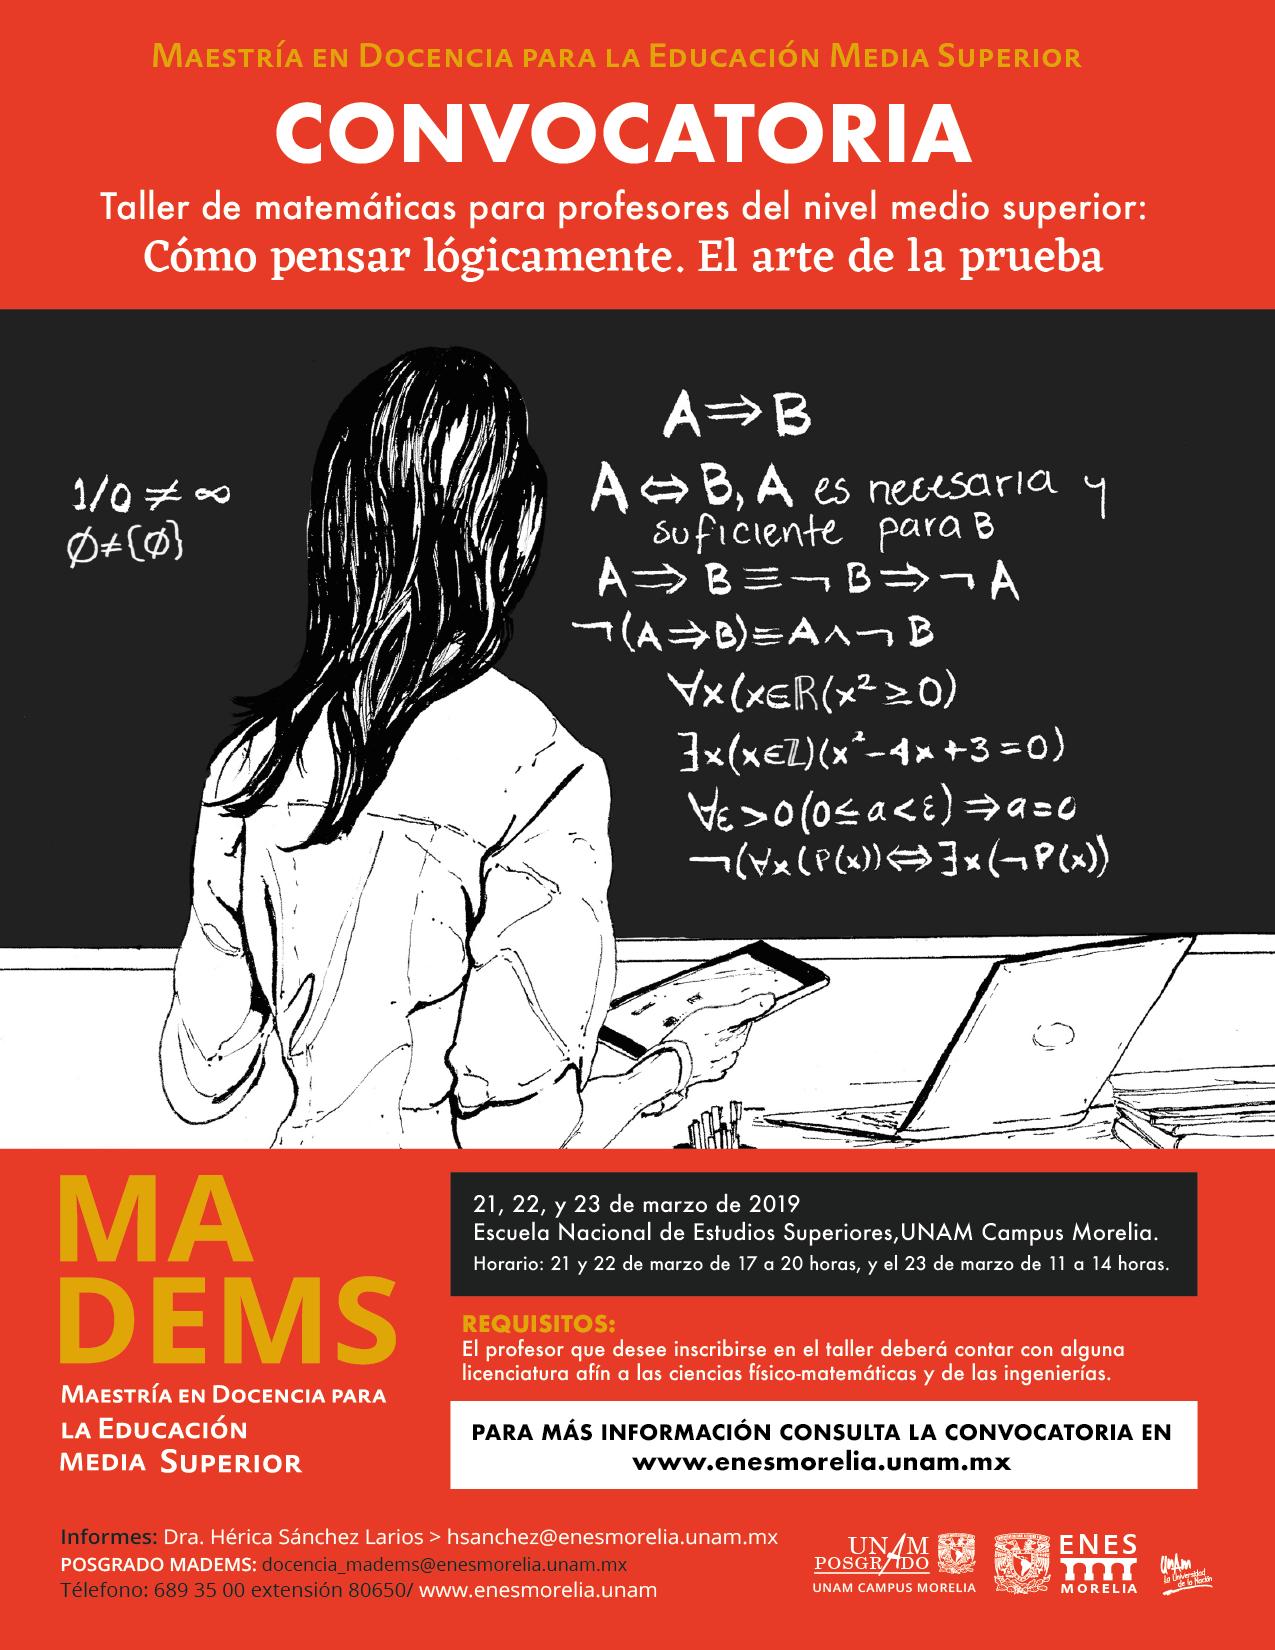 mademsFEB2019-N-01